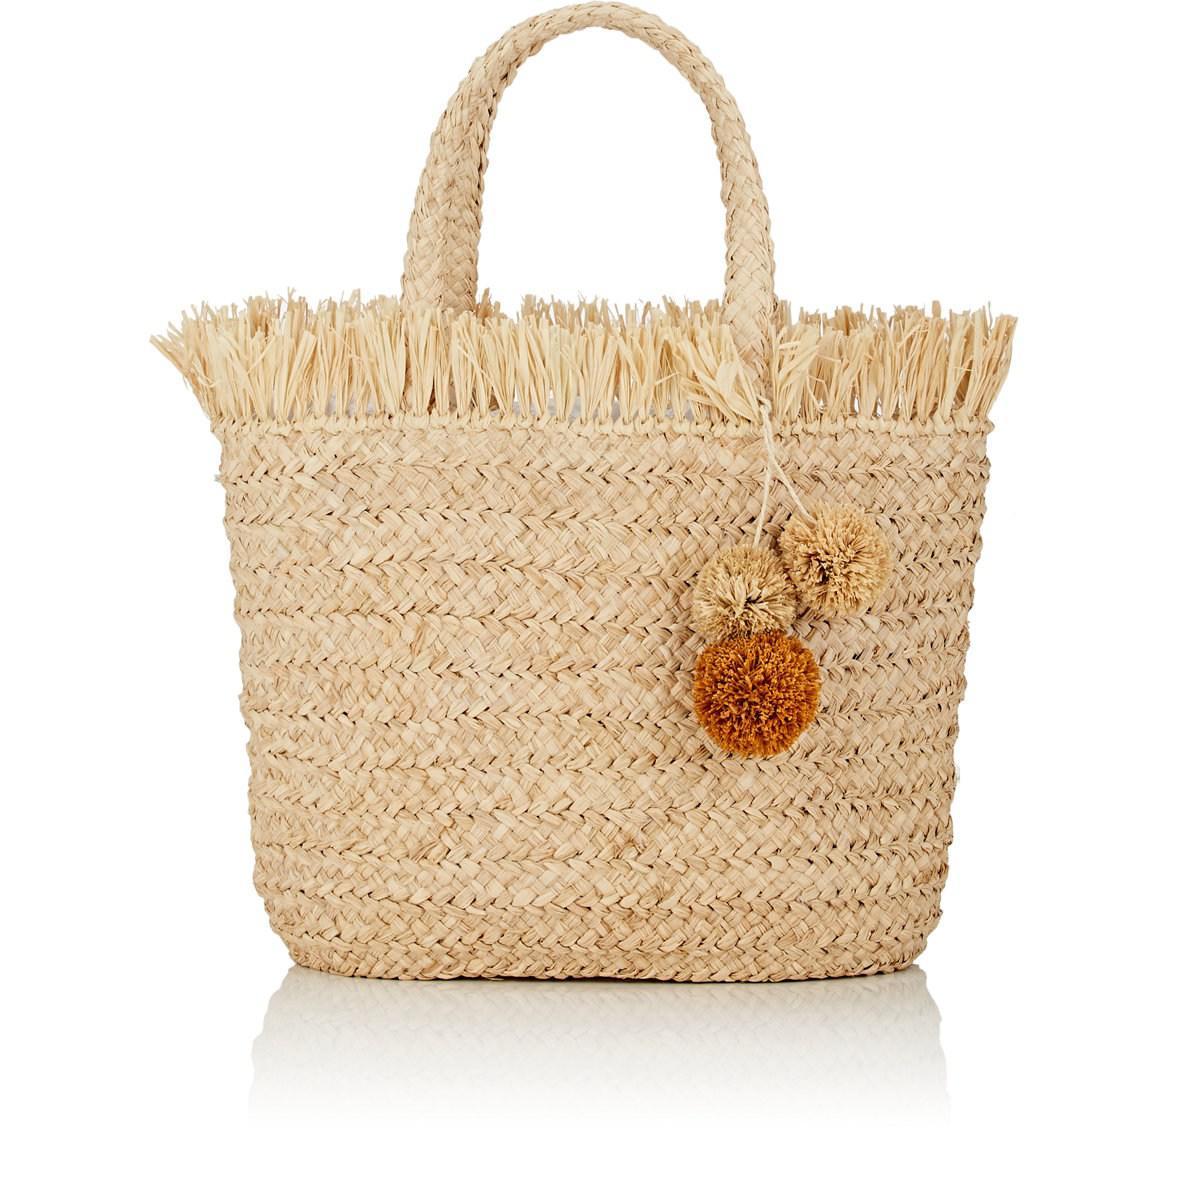 Icaria Green and Natural Raffia Beach Bag shNO3hc6